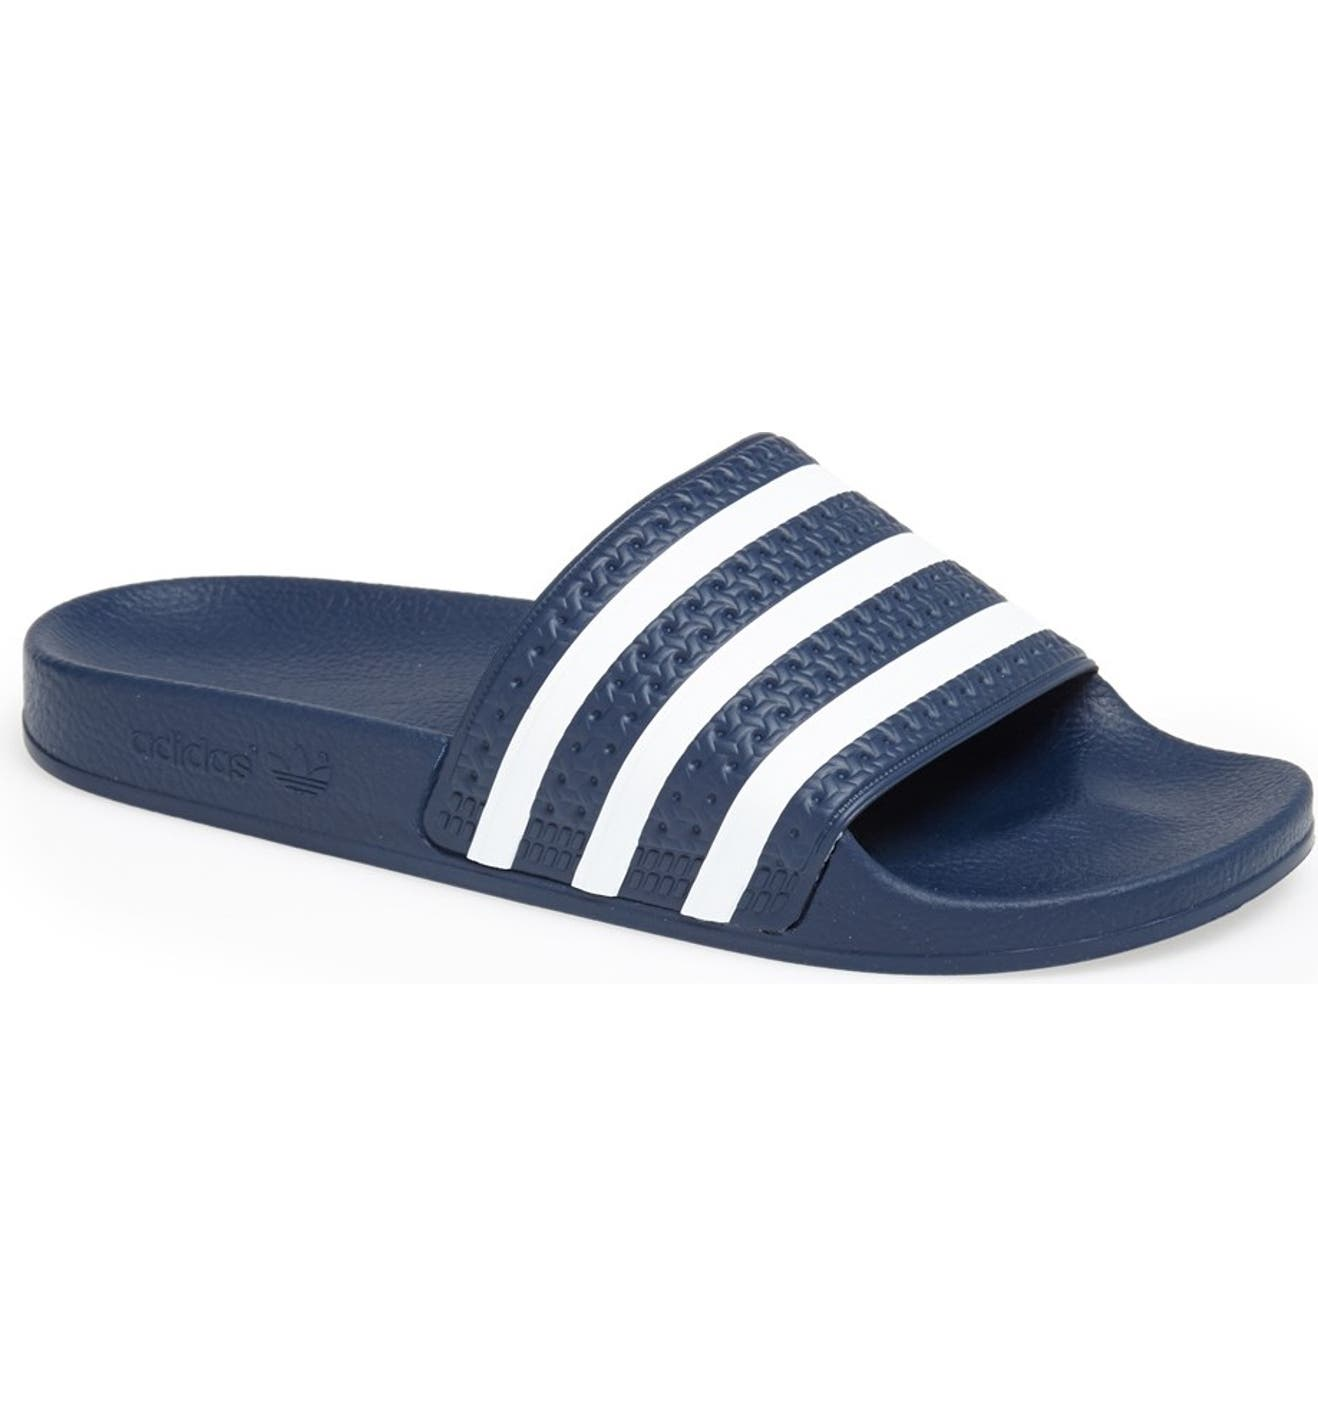 newest 505c0 75ea4 adidas Adilette Slide Sandal (Women)  Nordstrom